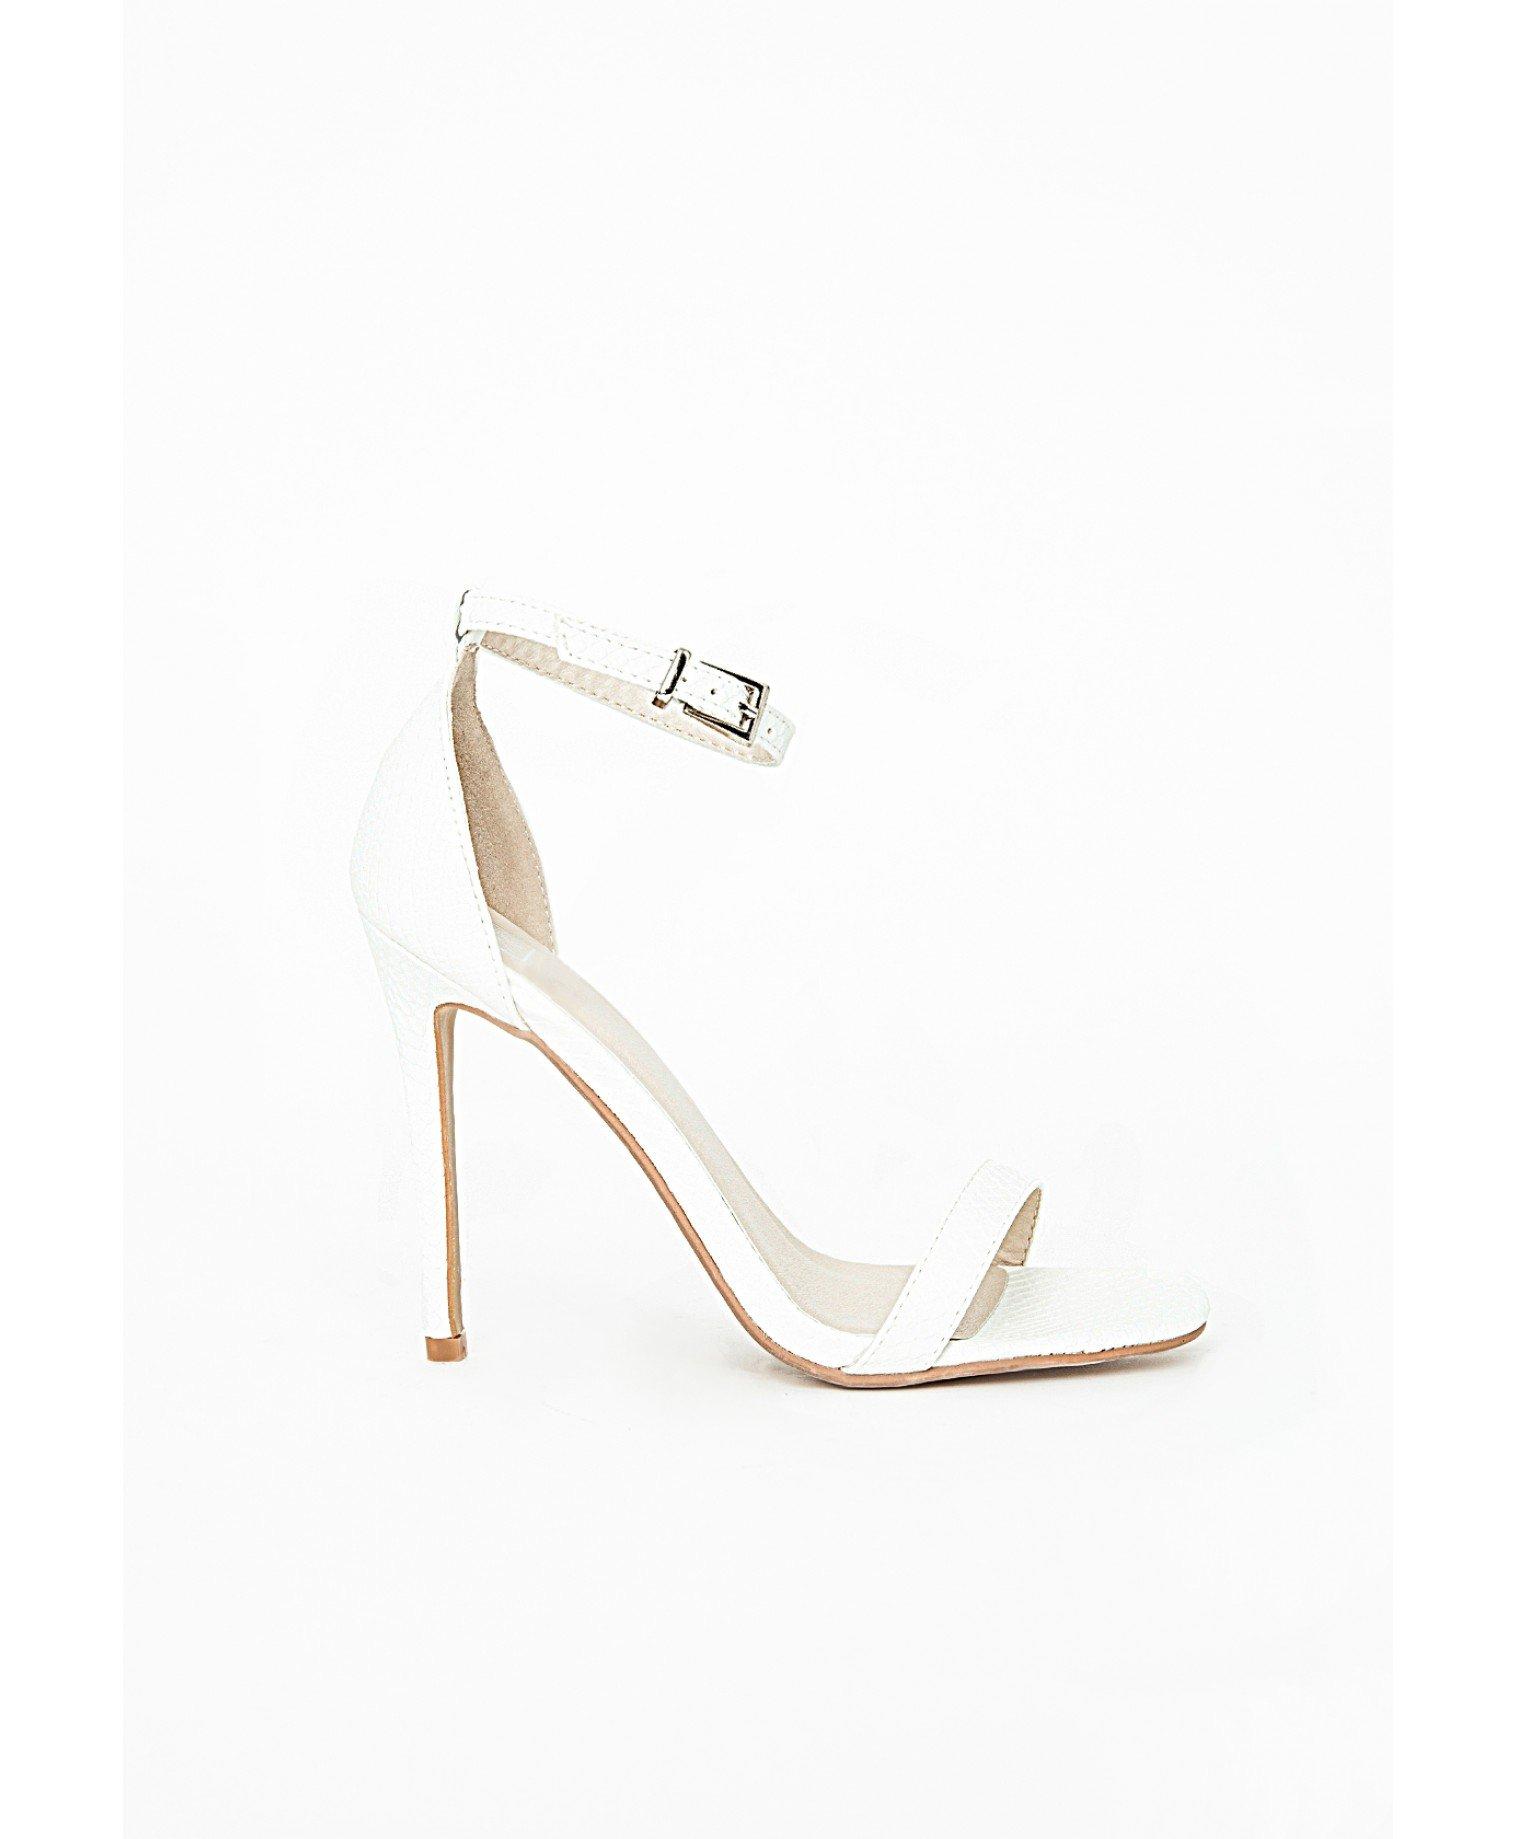 Missguided Clara Snakeskin White Strappy Sandals in White | Lyst